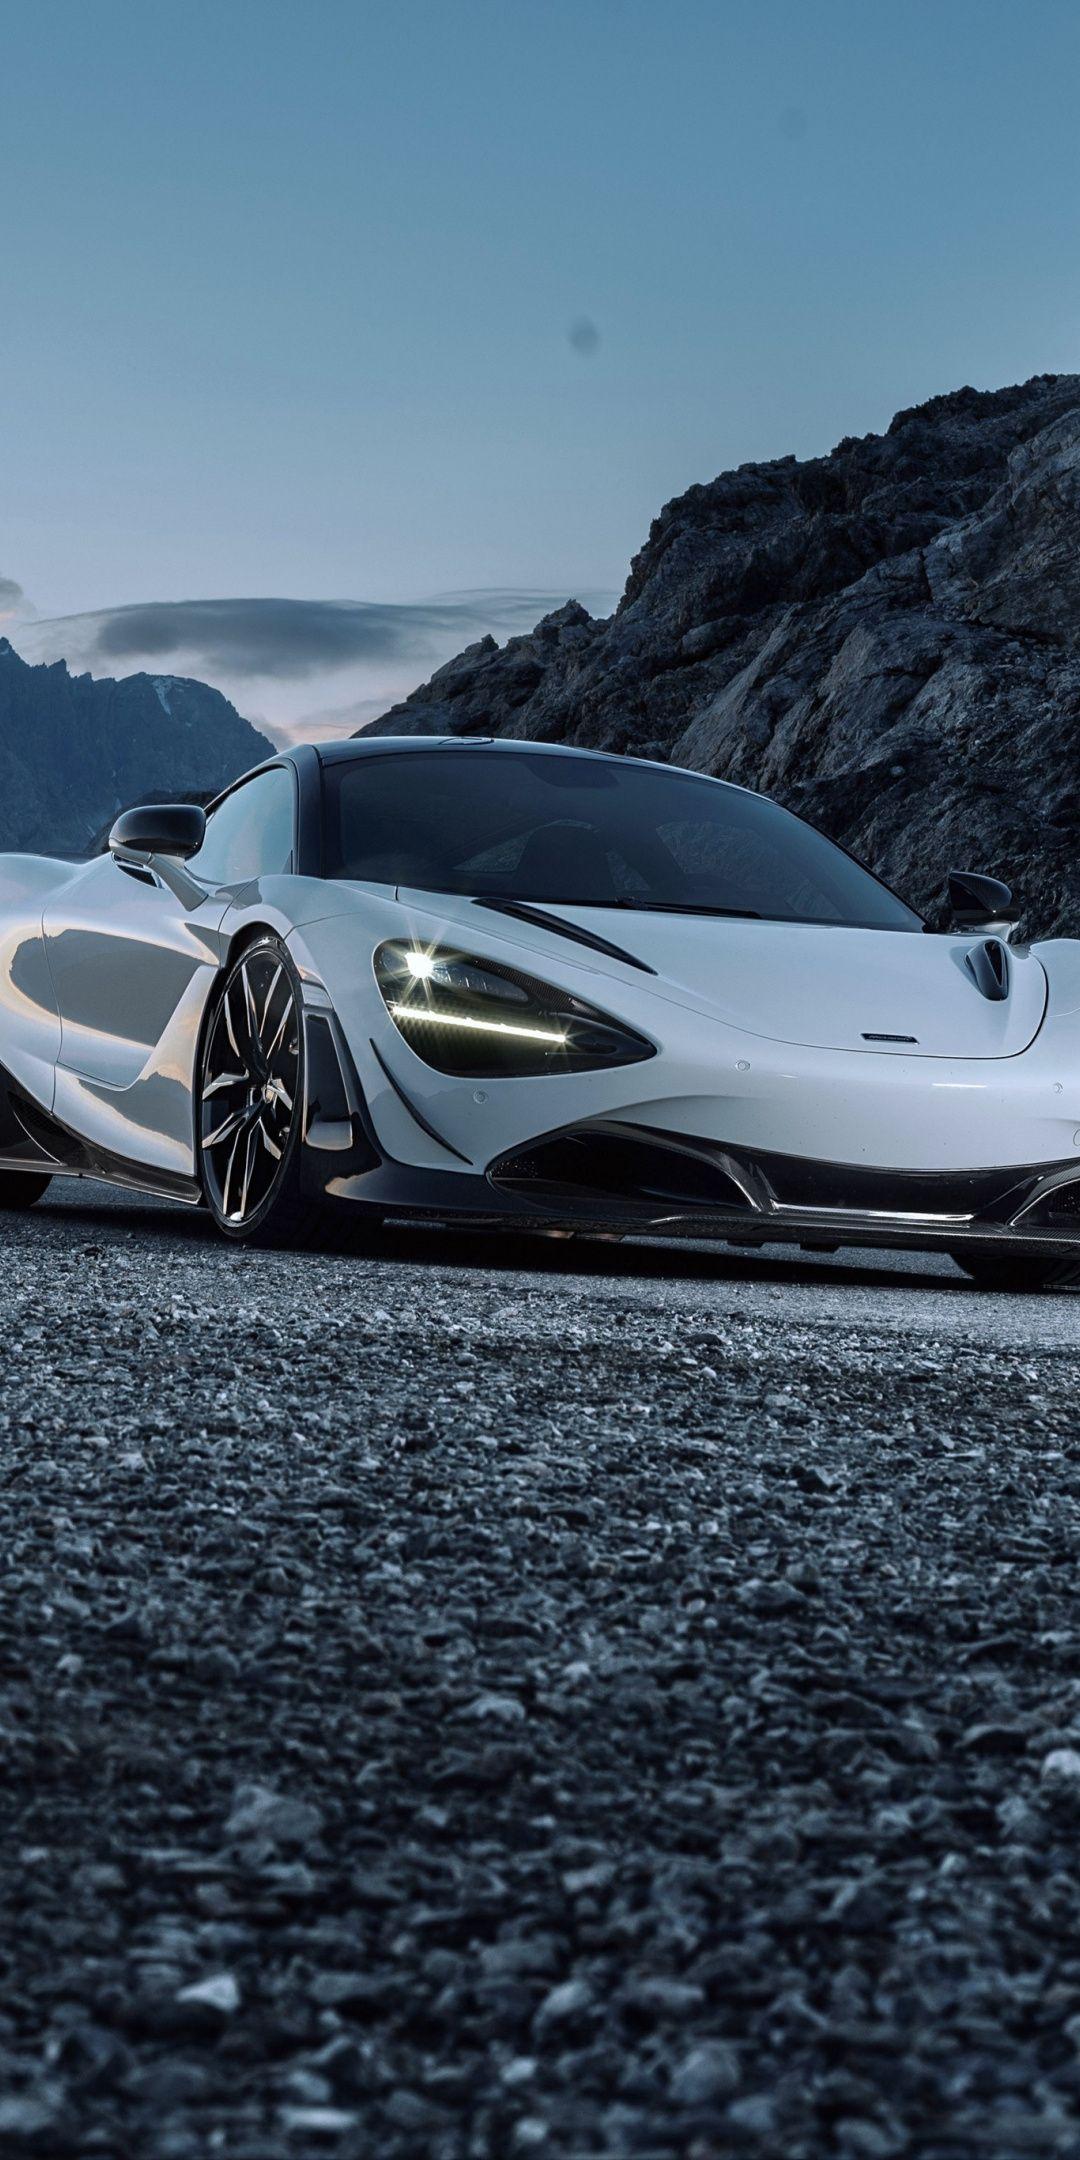 Front Mclaren 720s Sports Car 2018 1080x2160 Wallpaper Sports Cars Luxury Car Wallpapers Best Luxury Cars